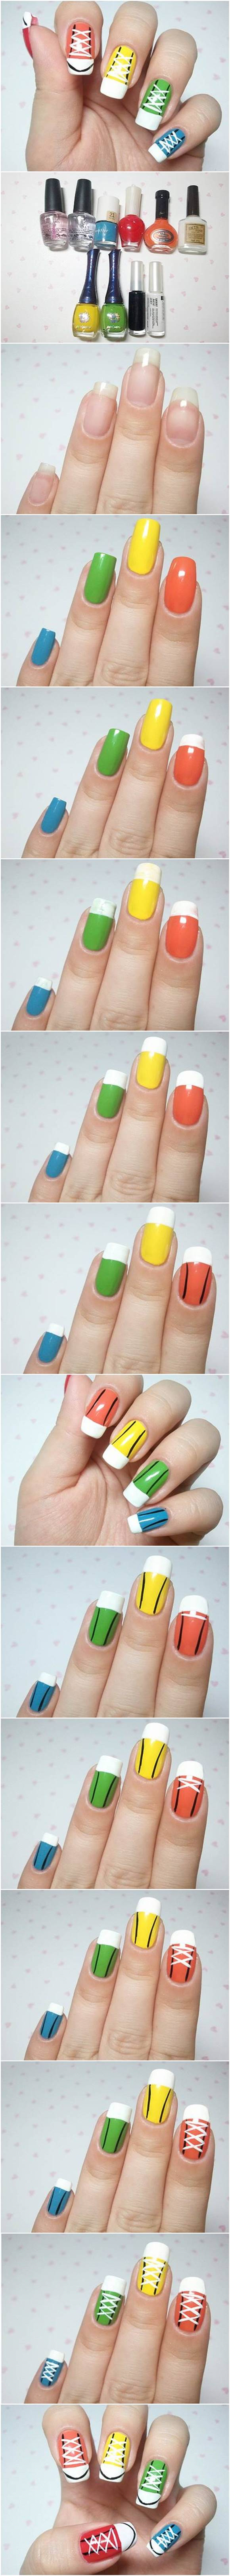 71d1eeb78ee9 How to DIY Cute Converse Sneakers Nail Art